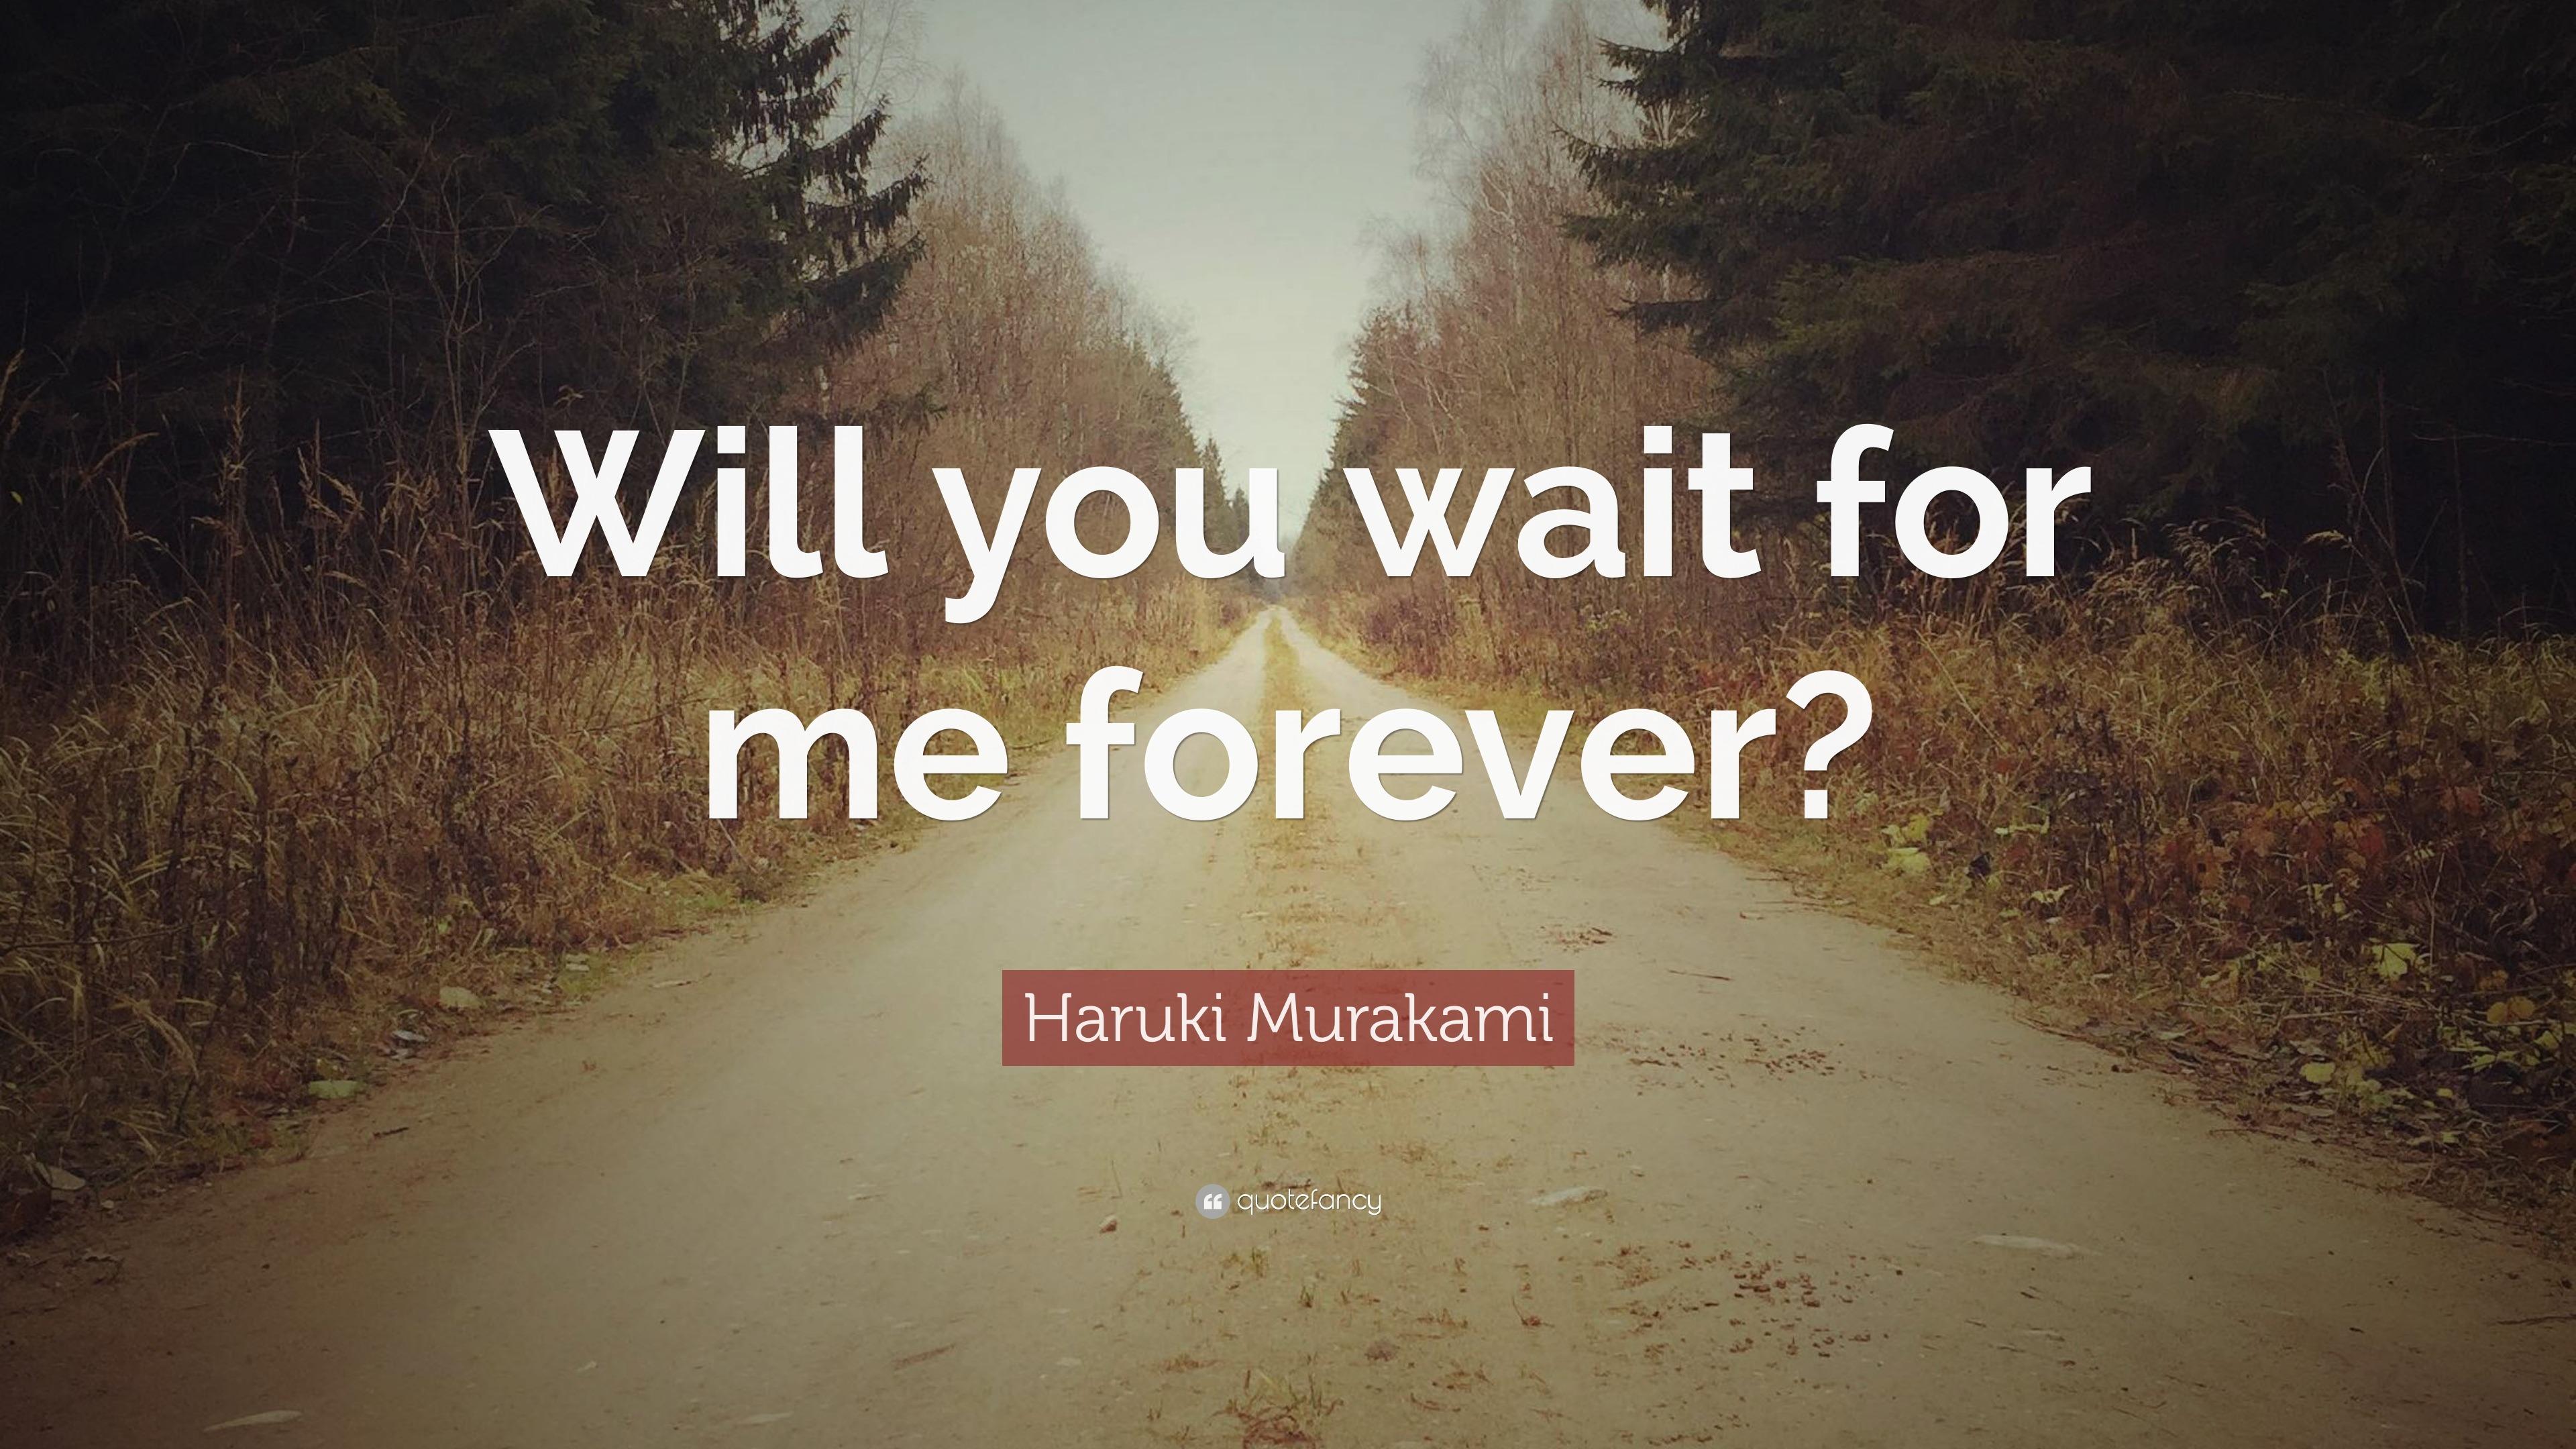 Haruki Murakami Quotes (100 Wallpapers)